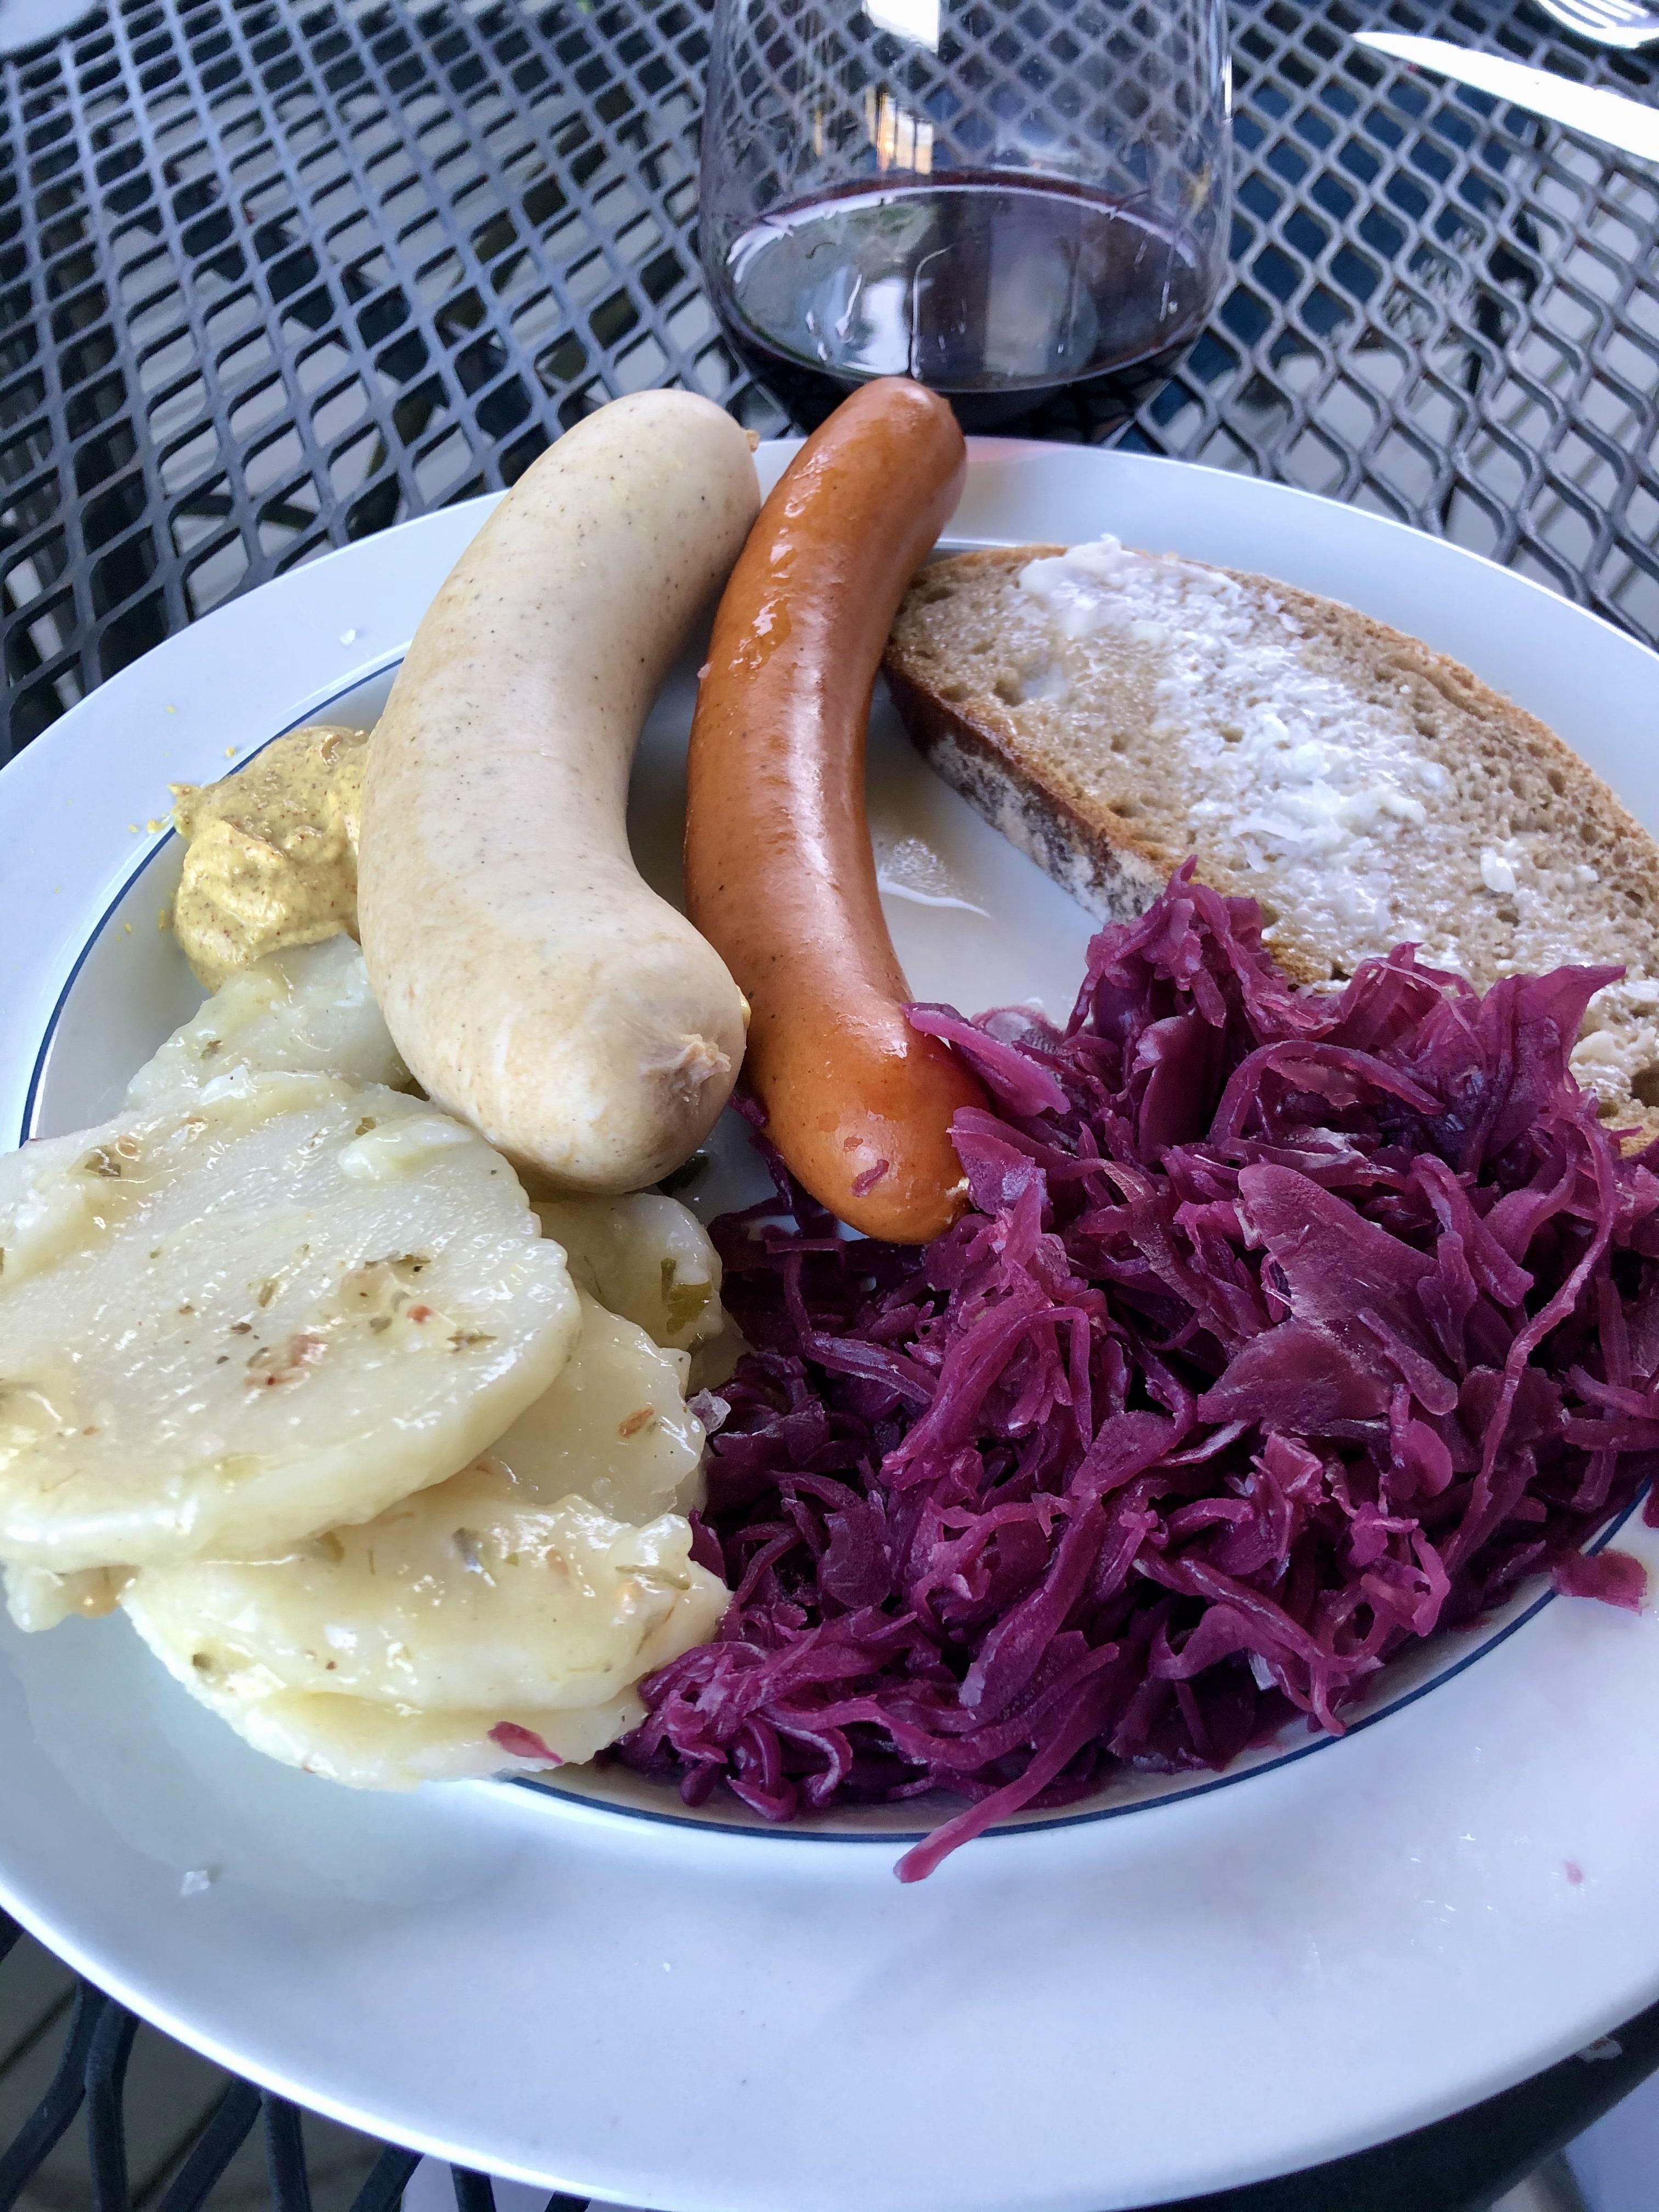 German Sausage Plate